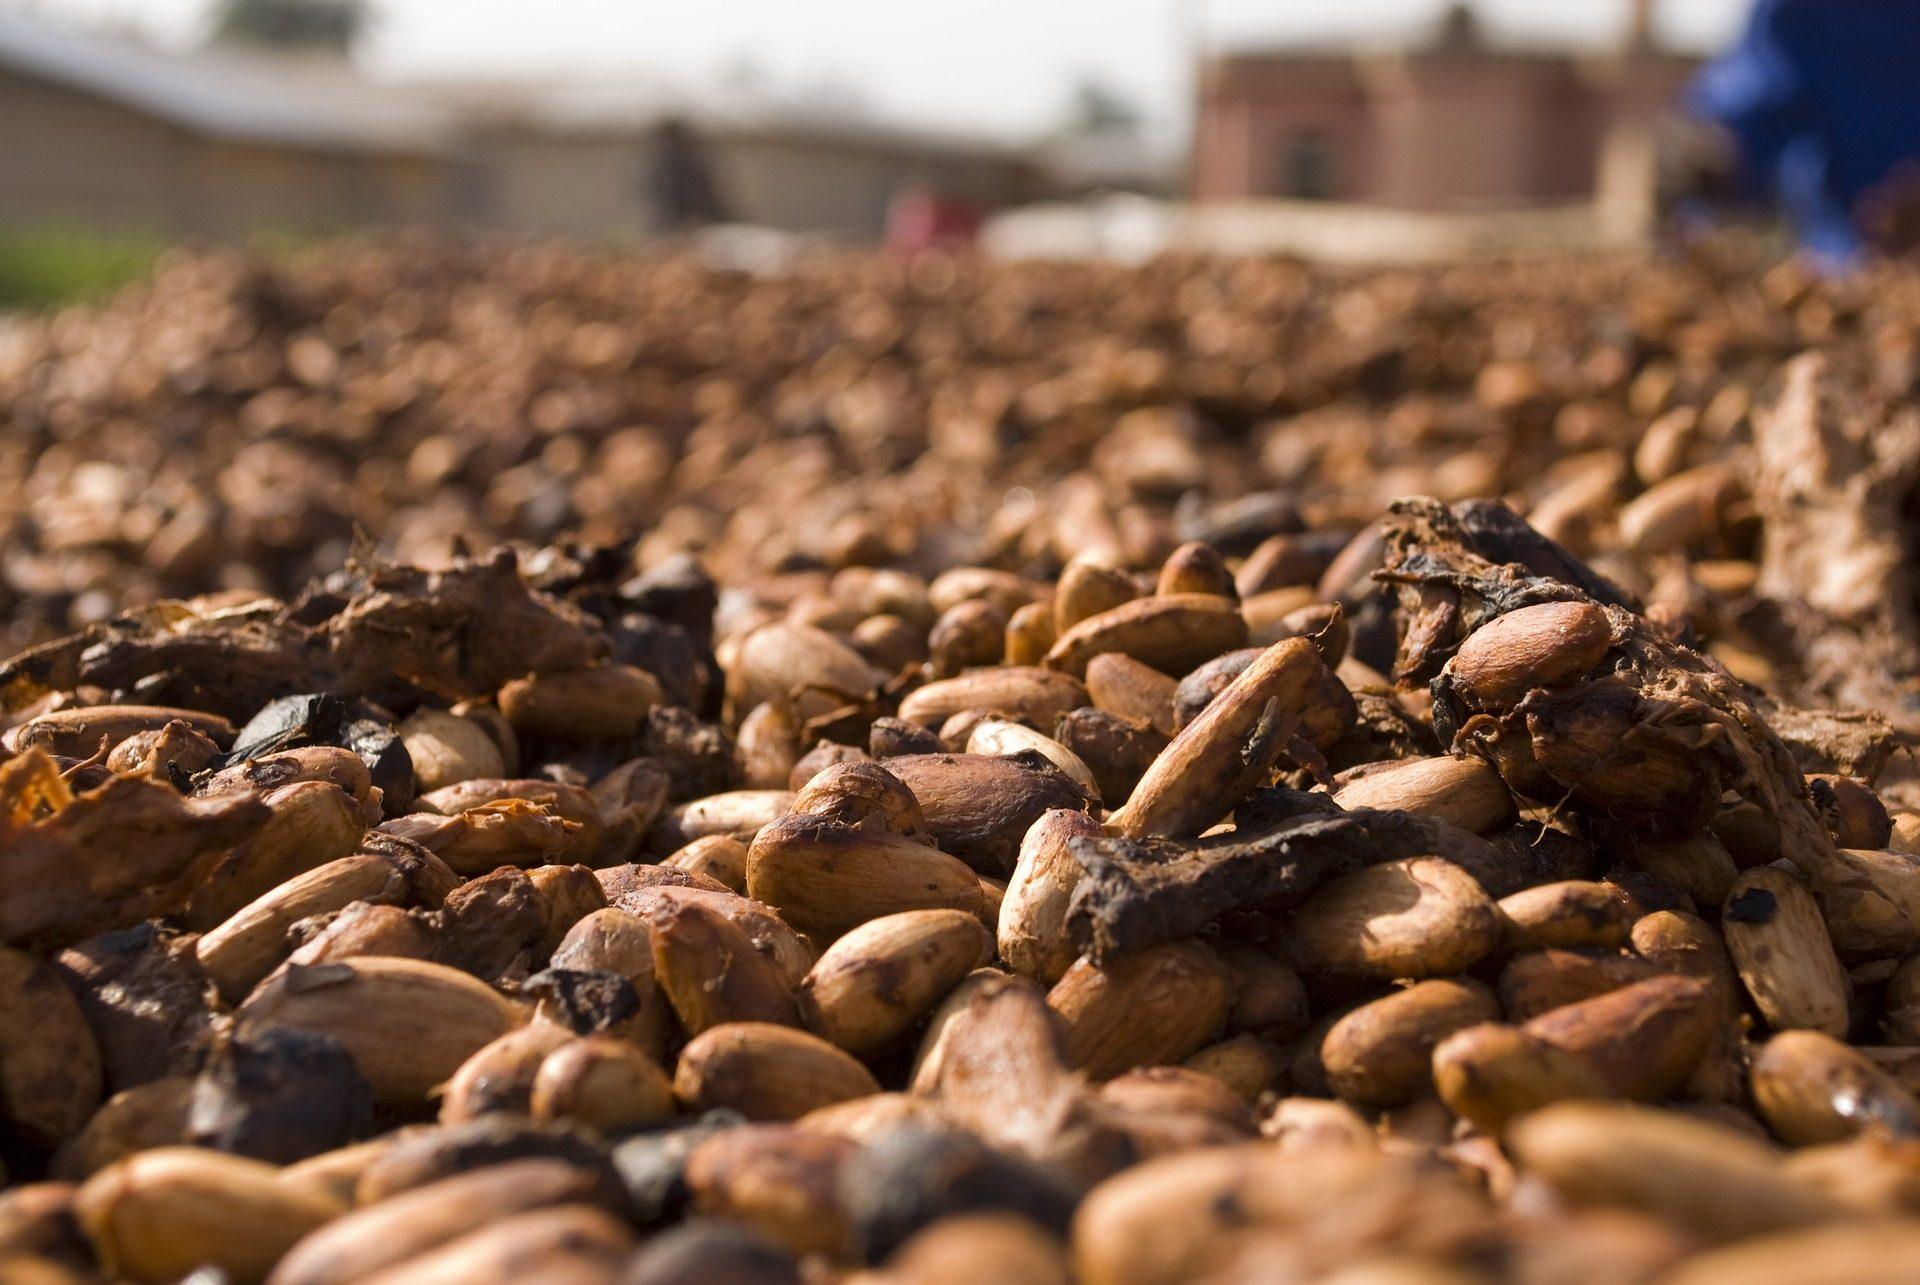 grains de, cacao, chocolat, recueille des, fruits - Fonds d'écran HD - Professor-falken.com